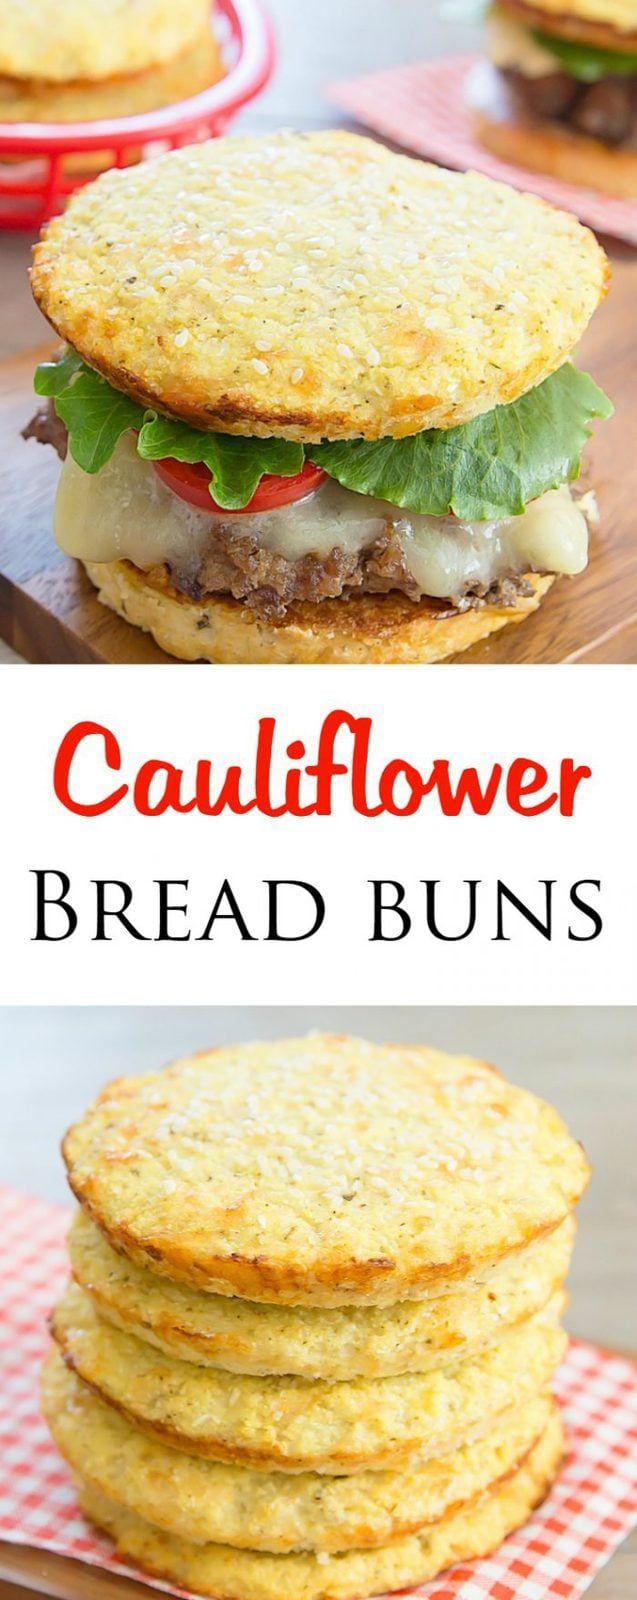 Cauliflower Bread Buns Recipe Optavia Cauliflower Bread